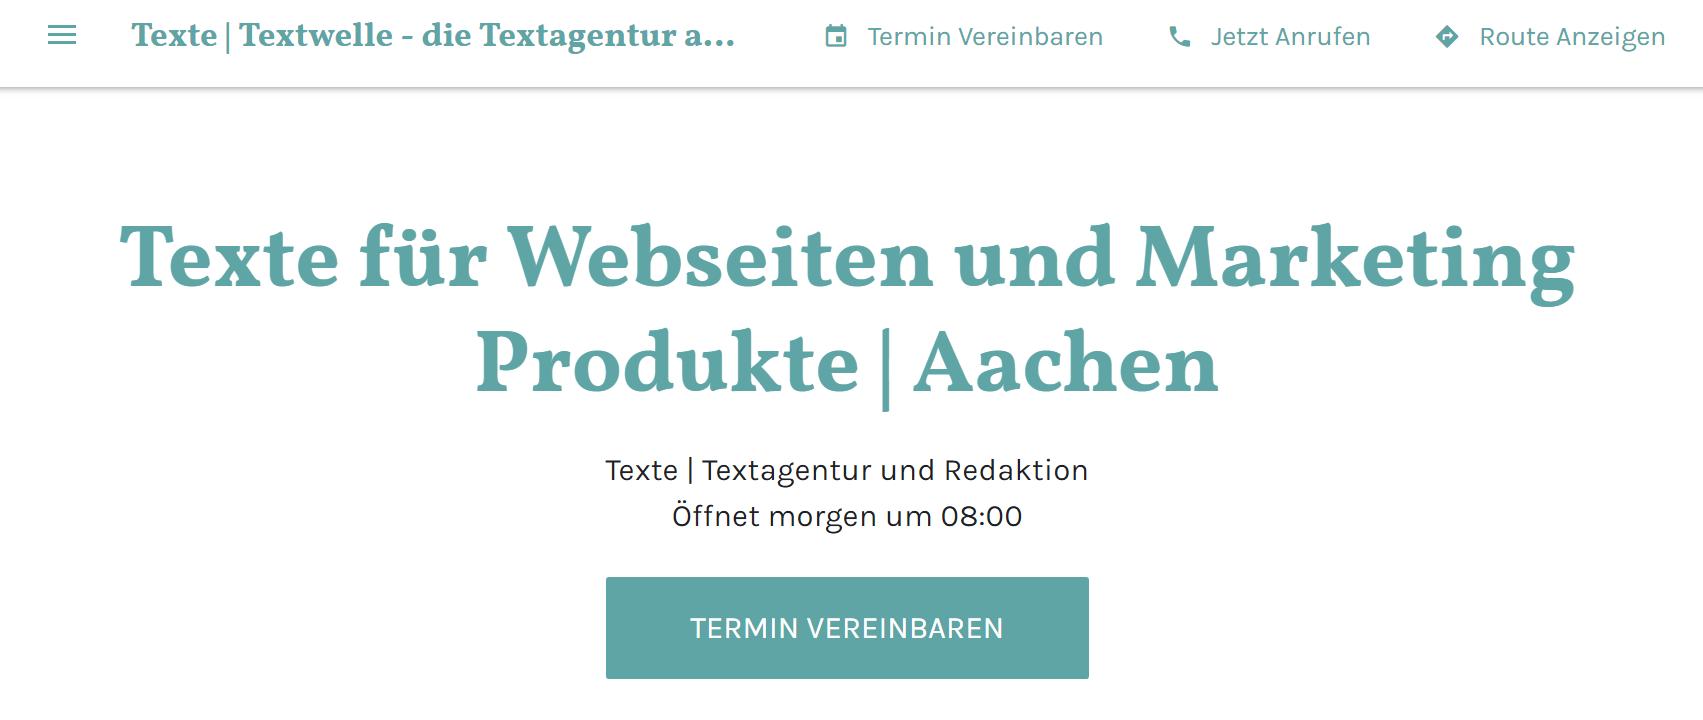 GmB textwelle screen - Empfehlungen als digitales Sprungbrett